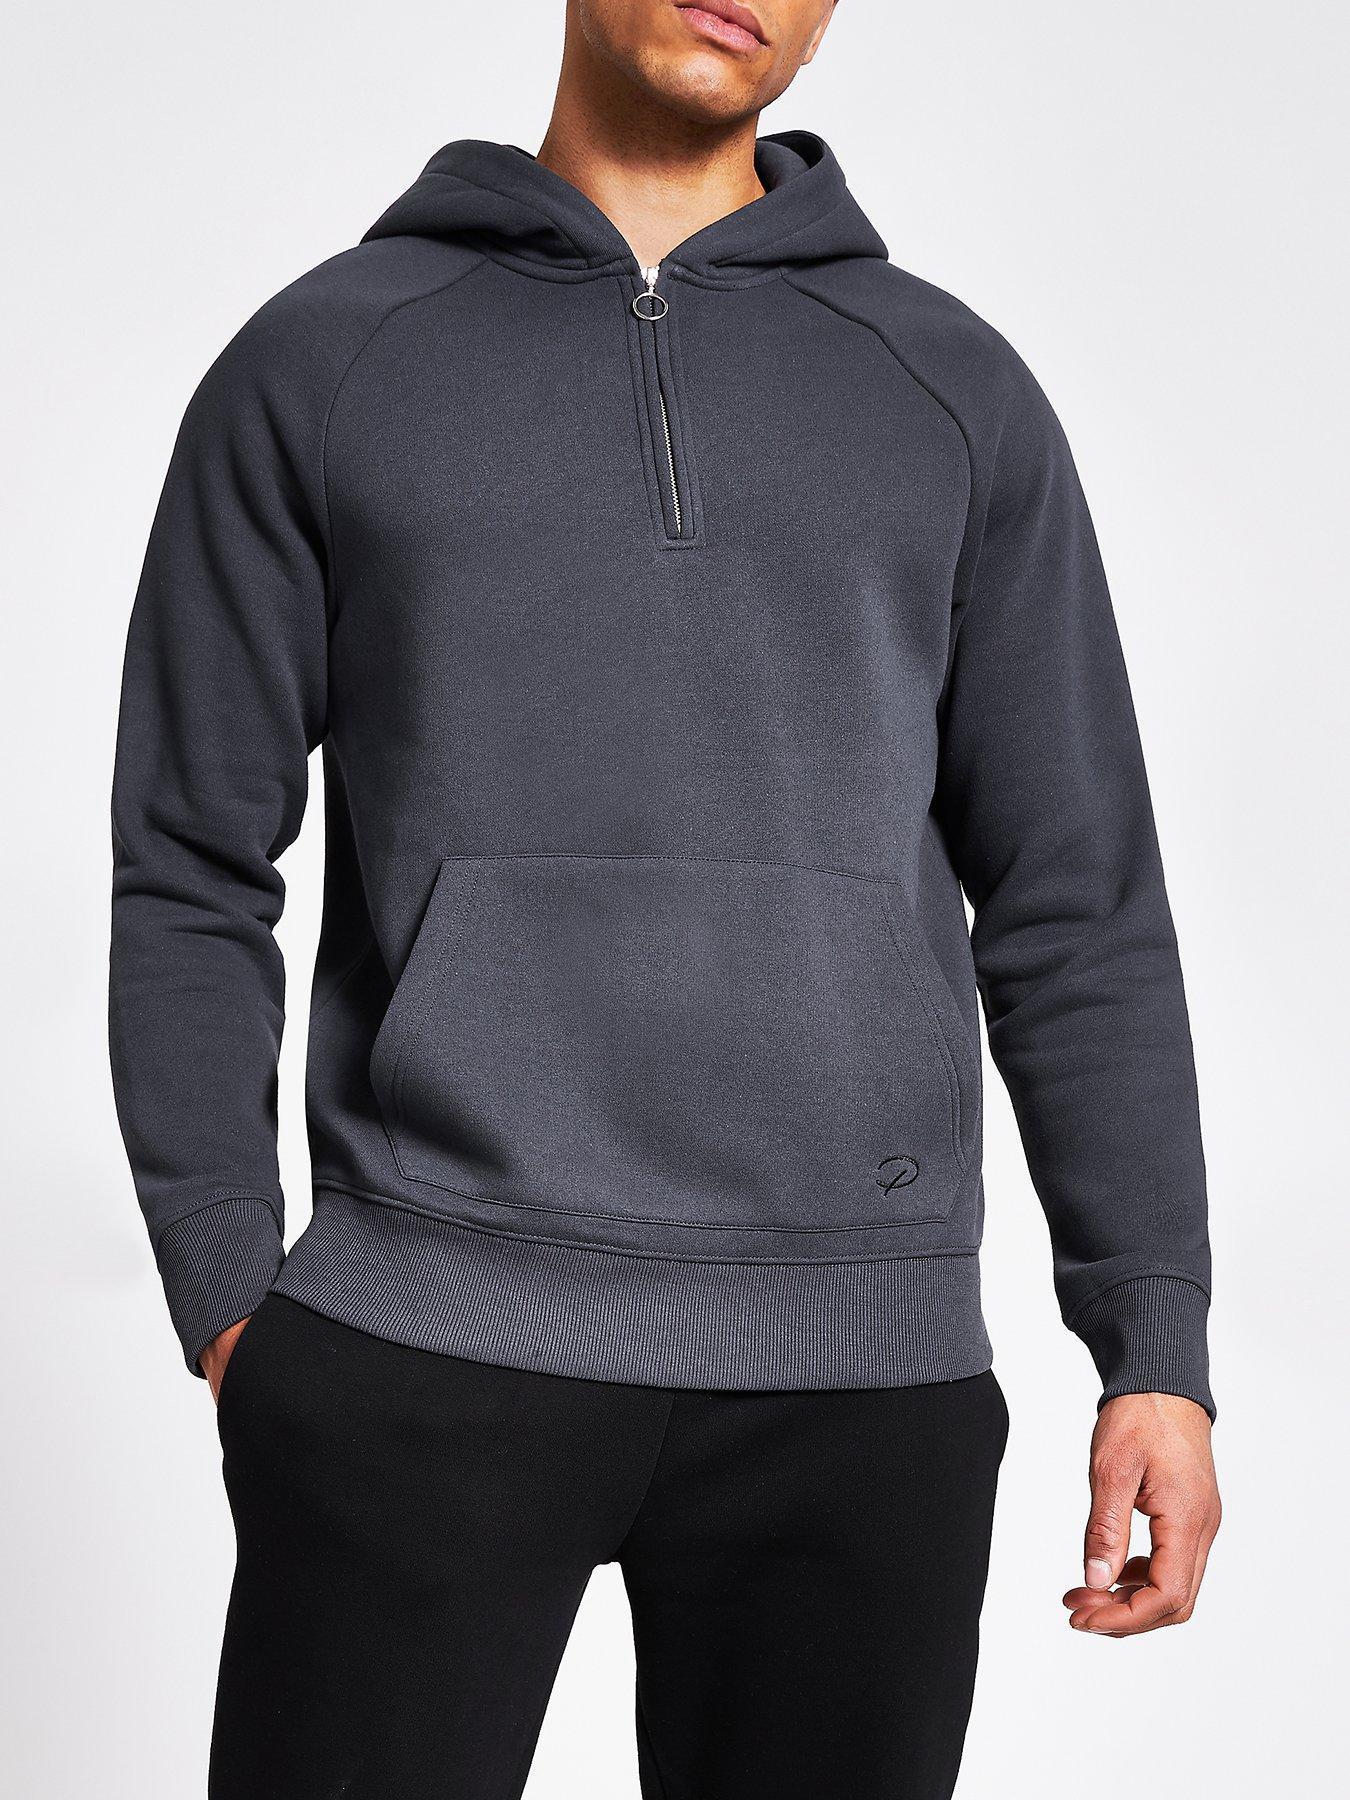 Rivers End Womens Crew Neck Sweatshirt Athletic Hoodies /& Sweatshirts Sweatshirt,